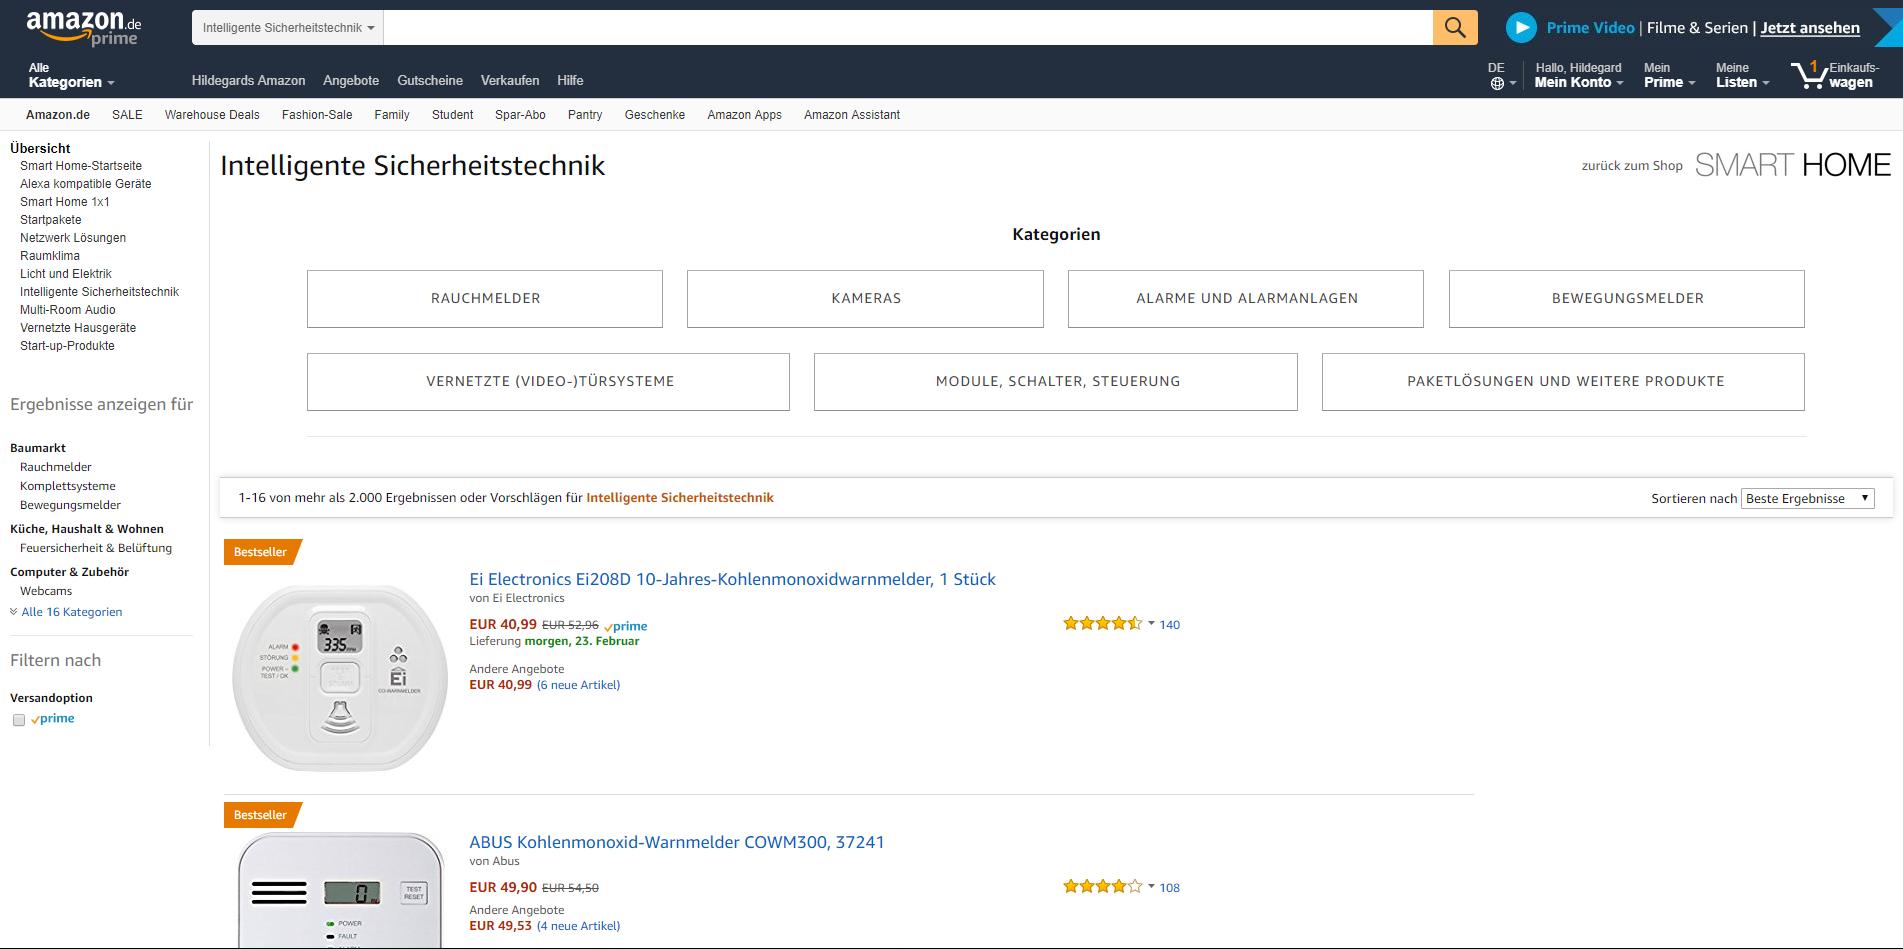 Alternativen Zu Amazon